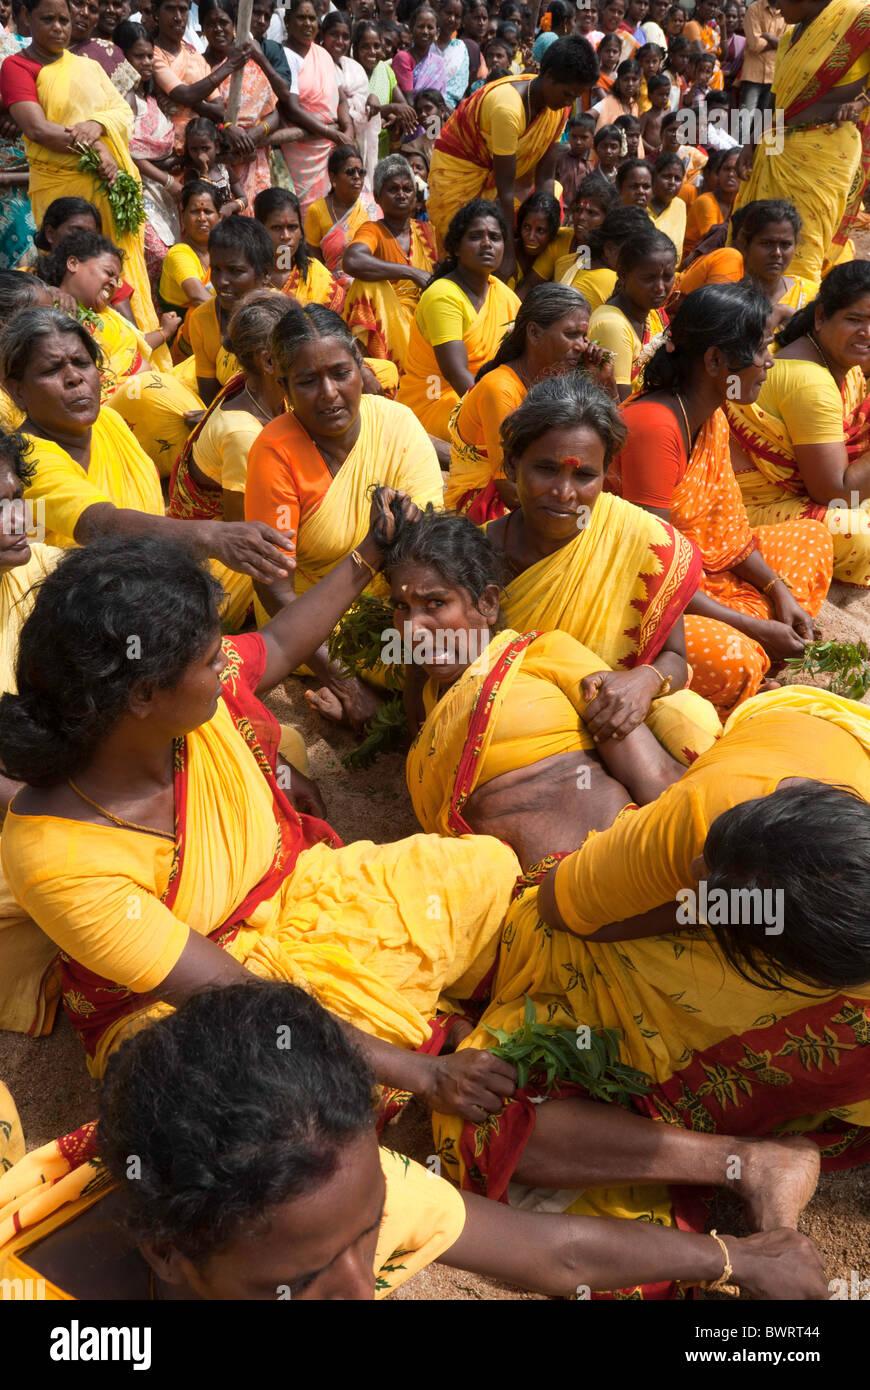 Patukalam festival at Sevelimedu in Kanchipuram, Tamil Nadu, South India, India. - Stock Image